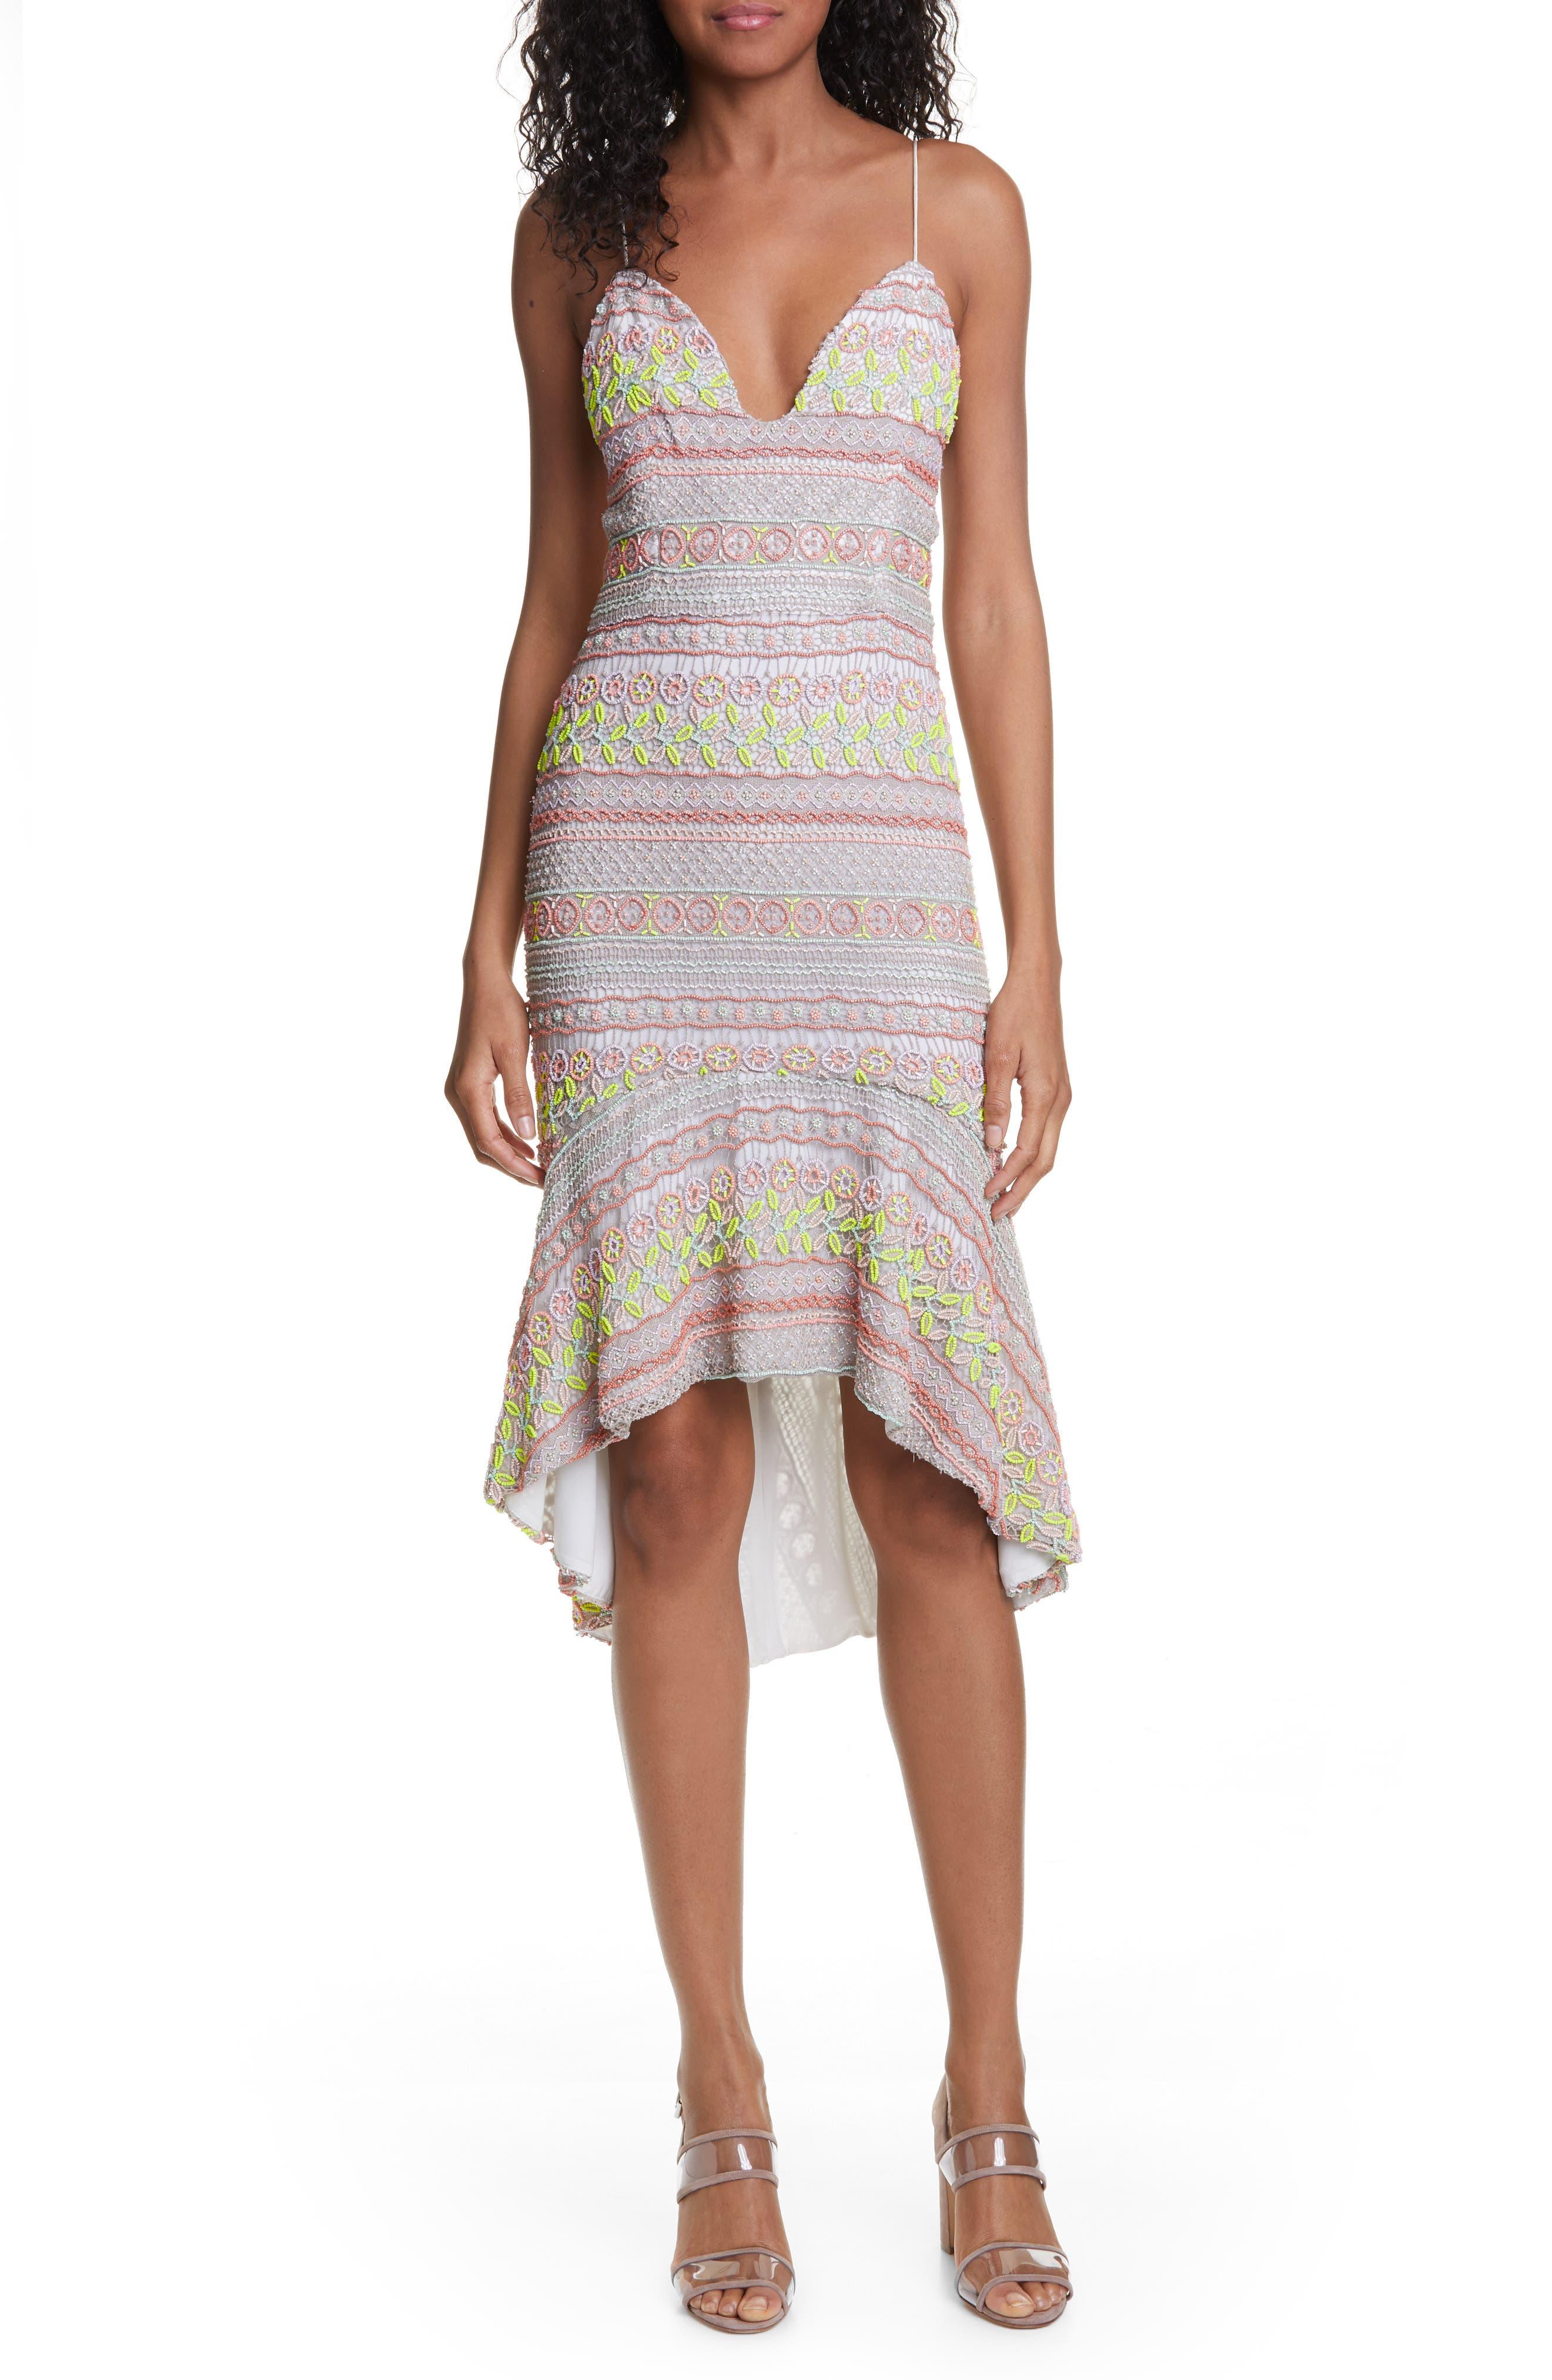 Alice + Olivia Amina All Over Embroidery Sweetheart Neck Cotton Dress, Ivory